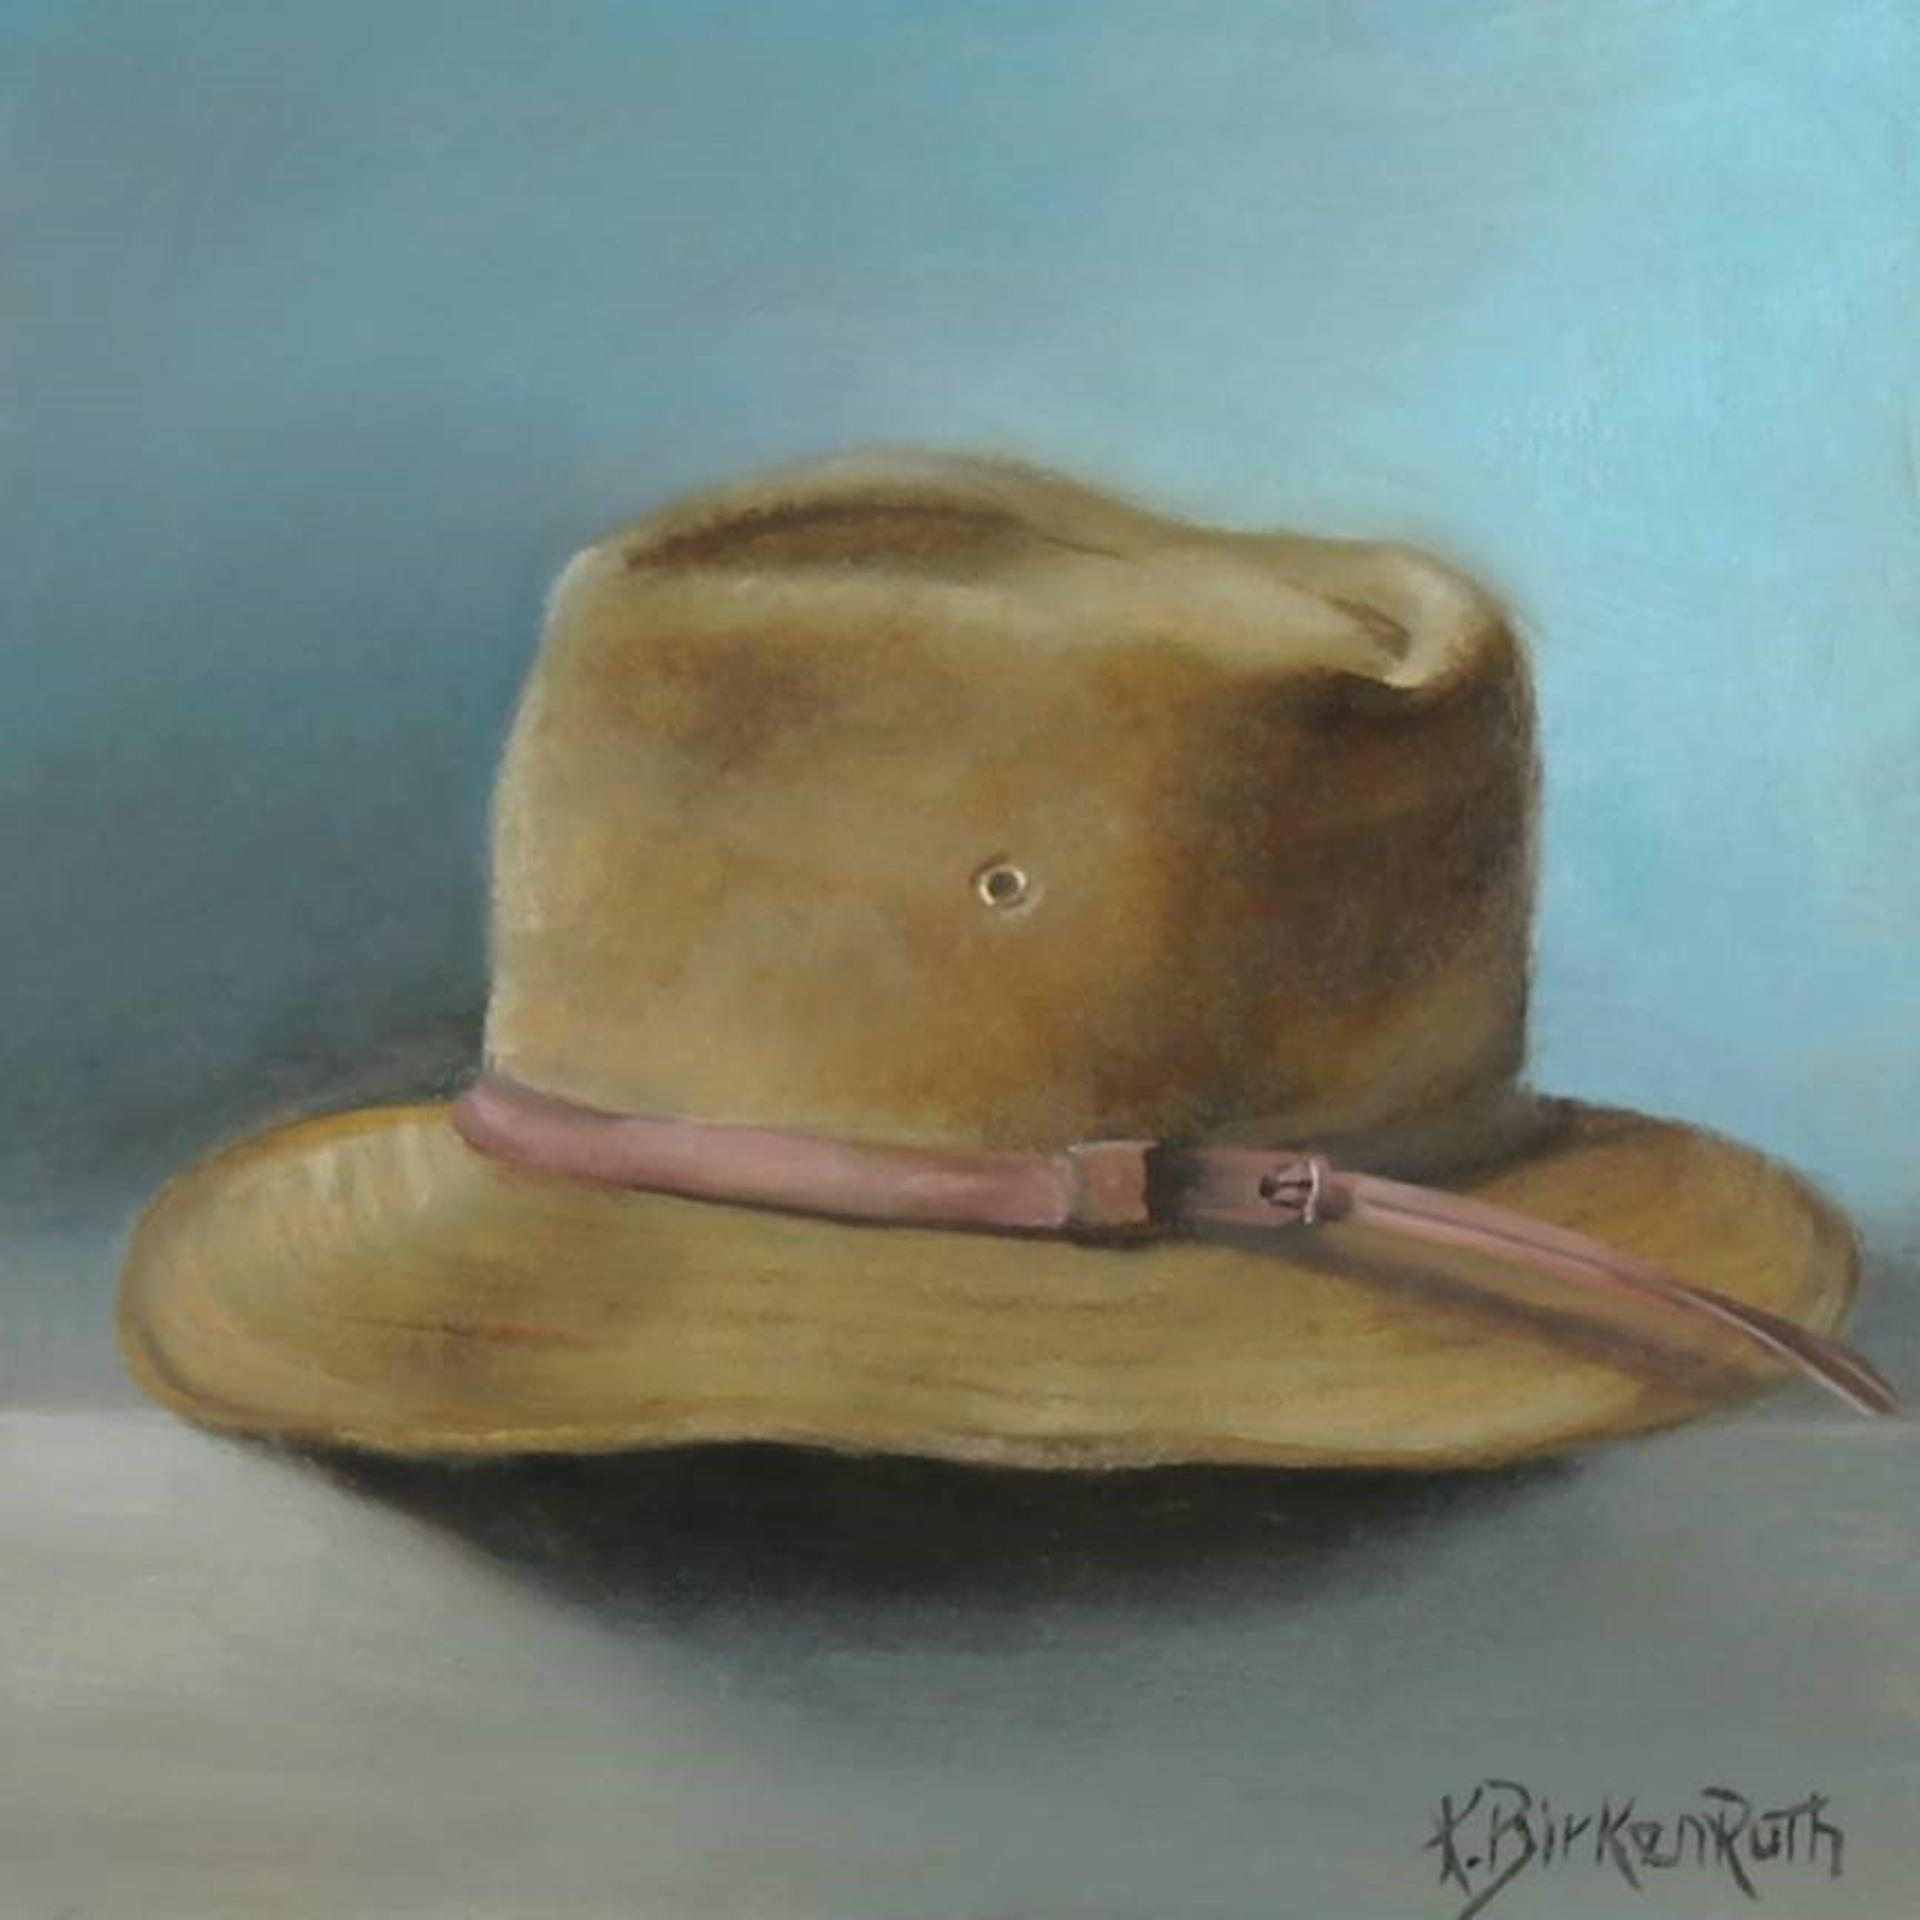 Outback by Kelly Birkenruth